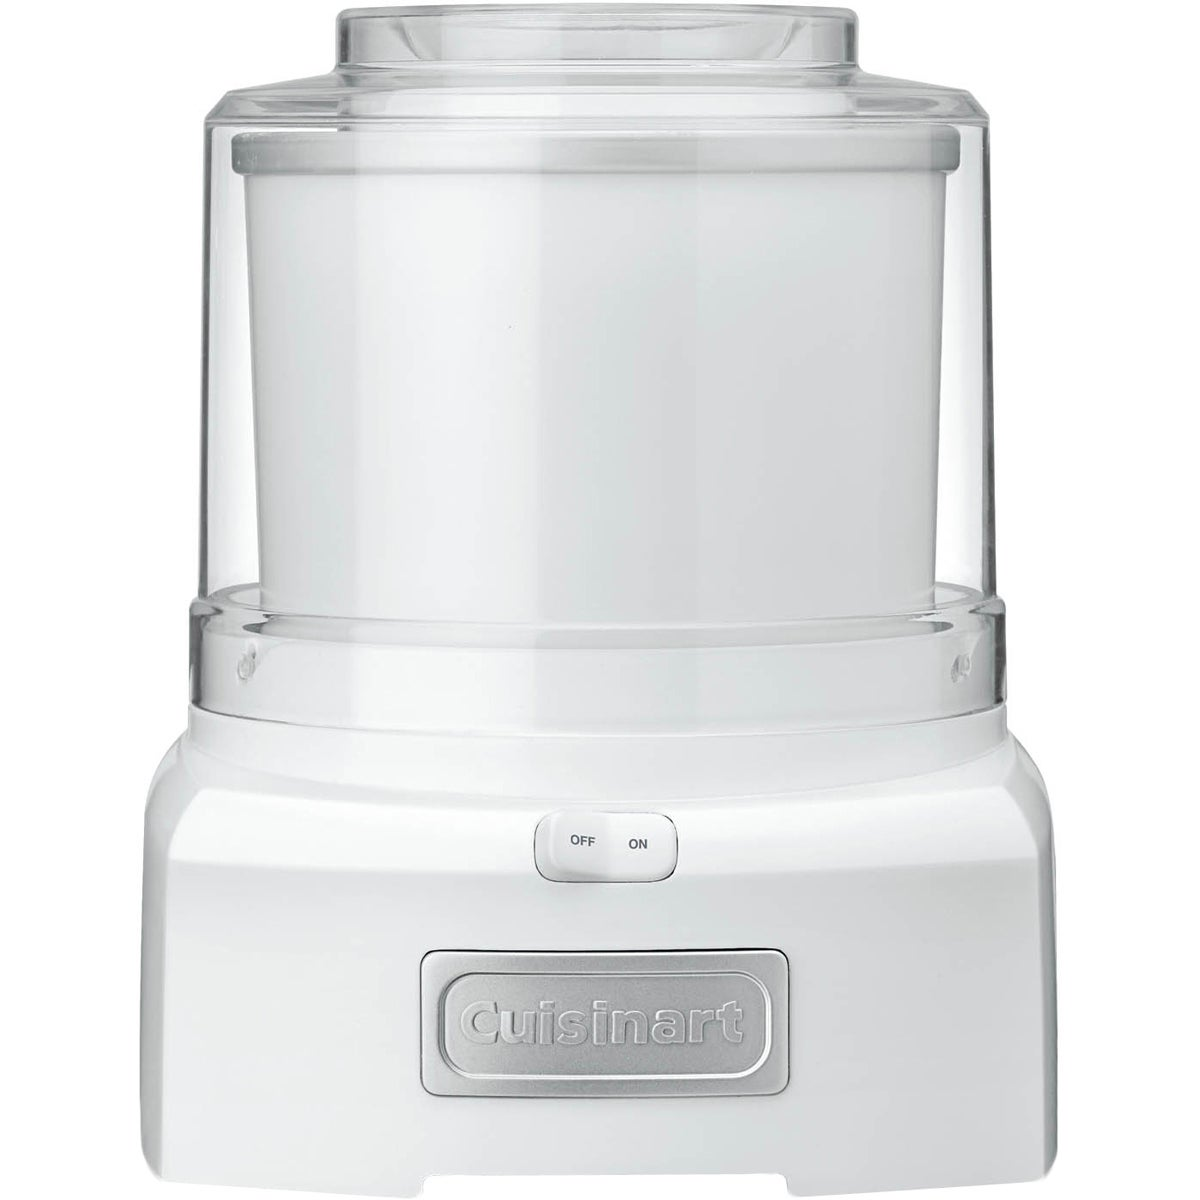 Conair Cuisinart Ice-21 1.5 Quart Frozen Yogurt-ice Cream...